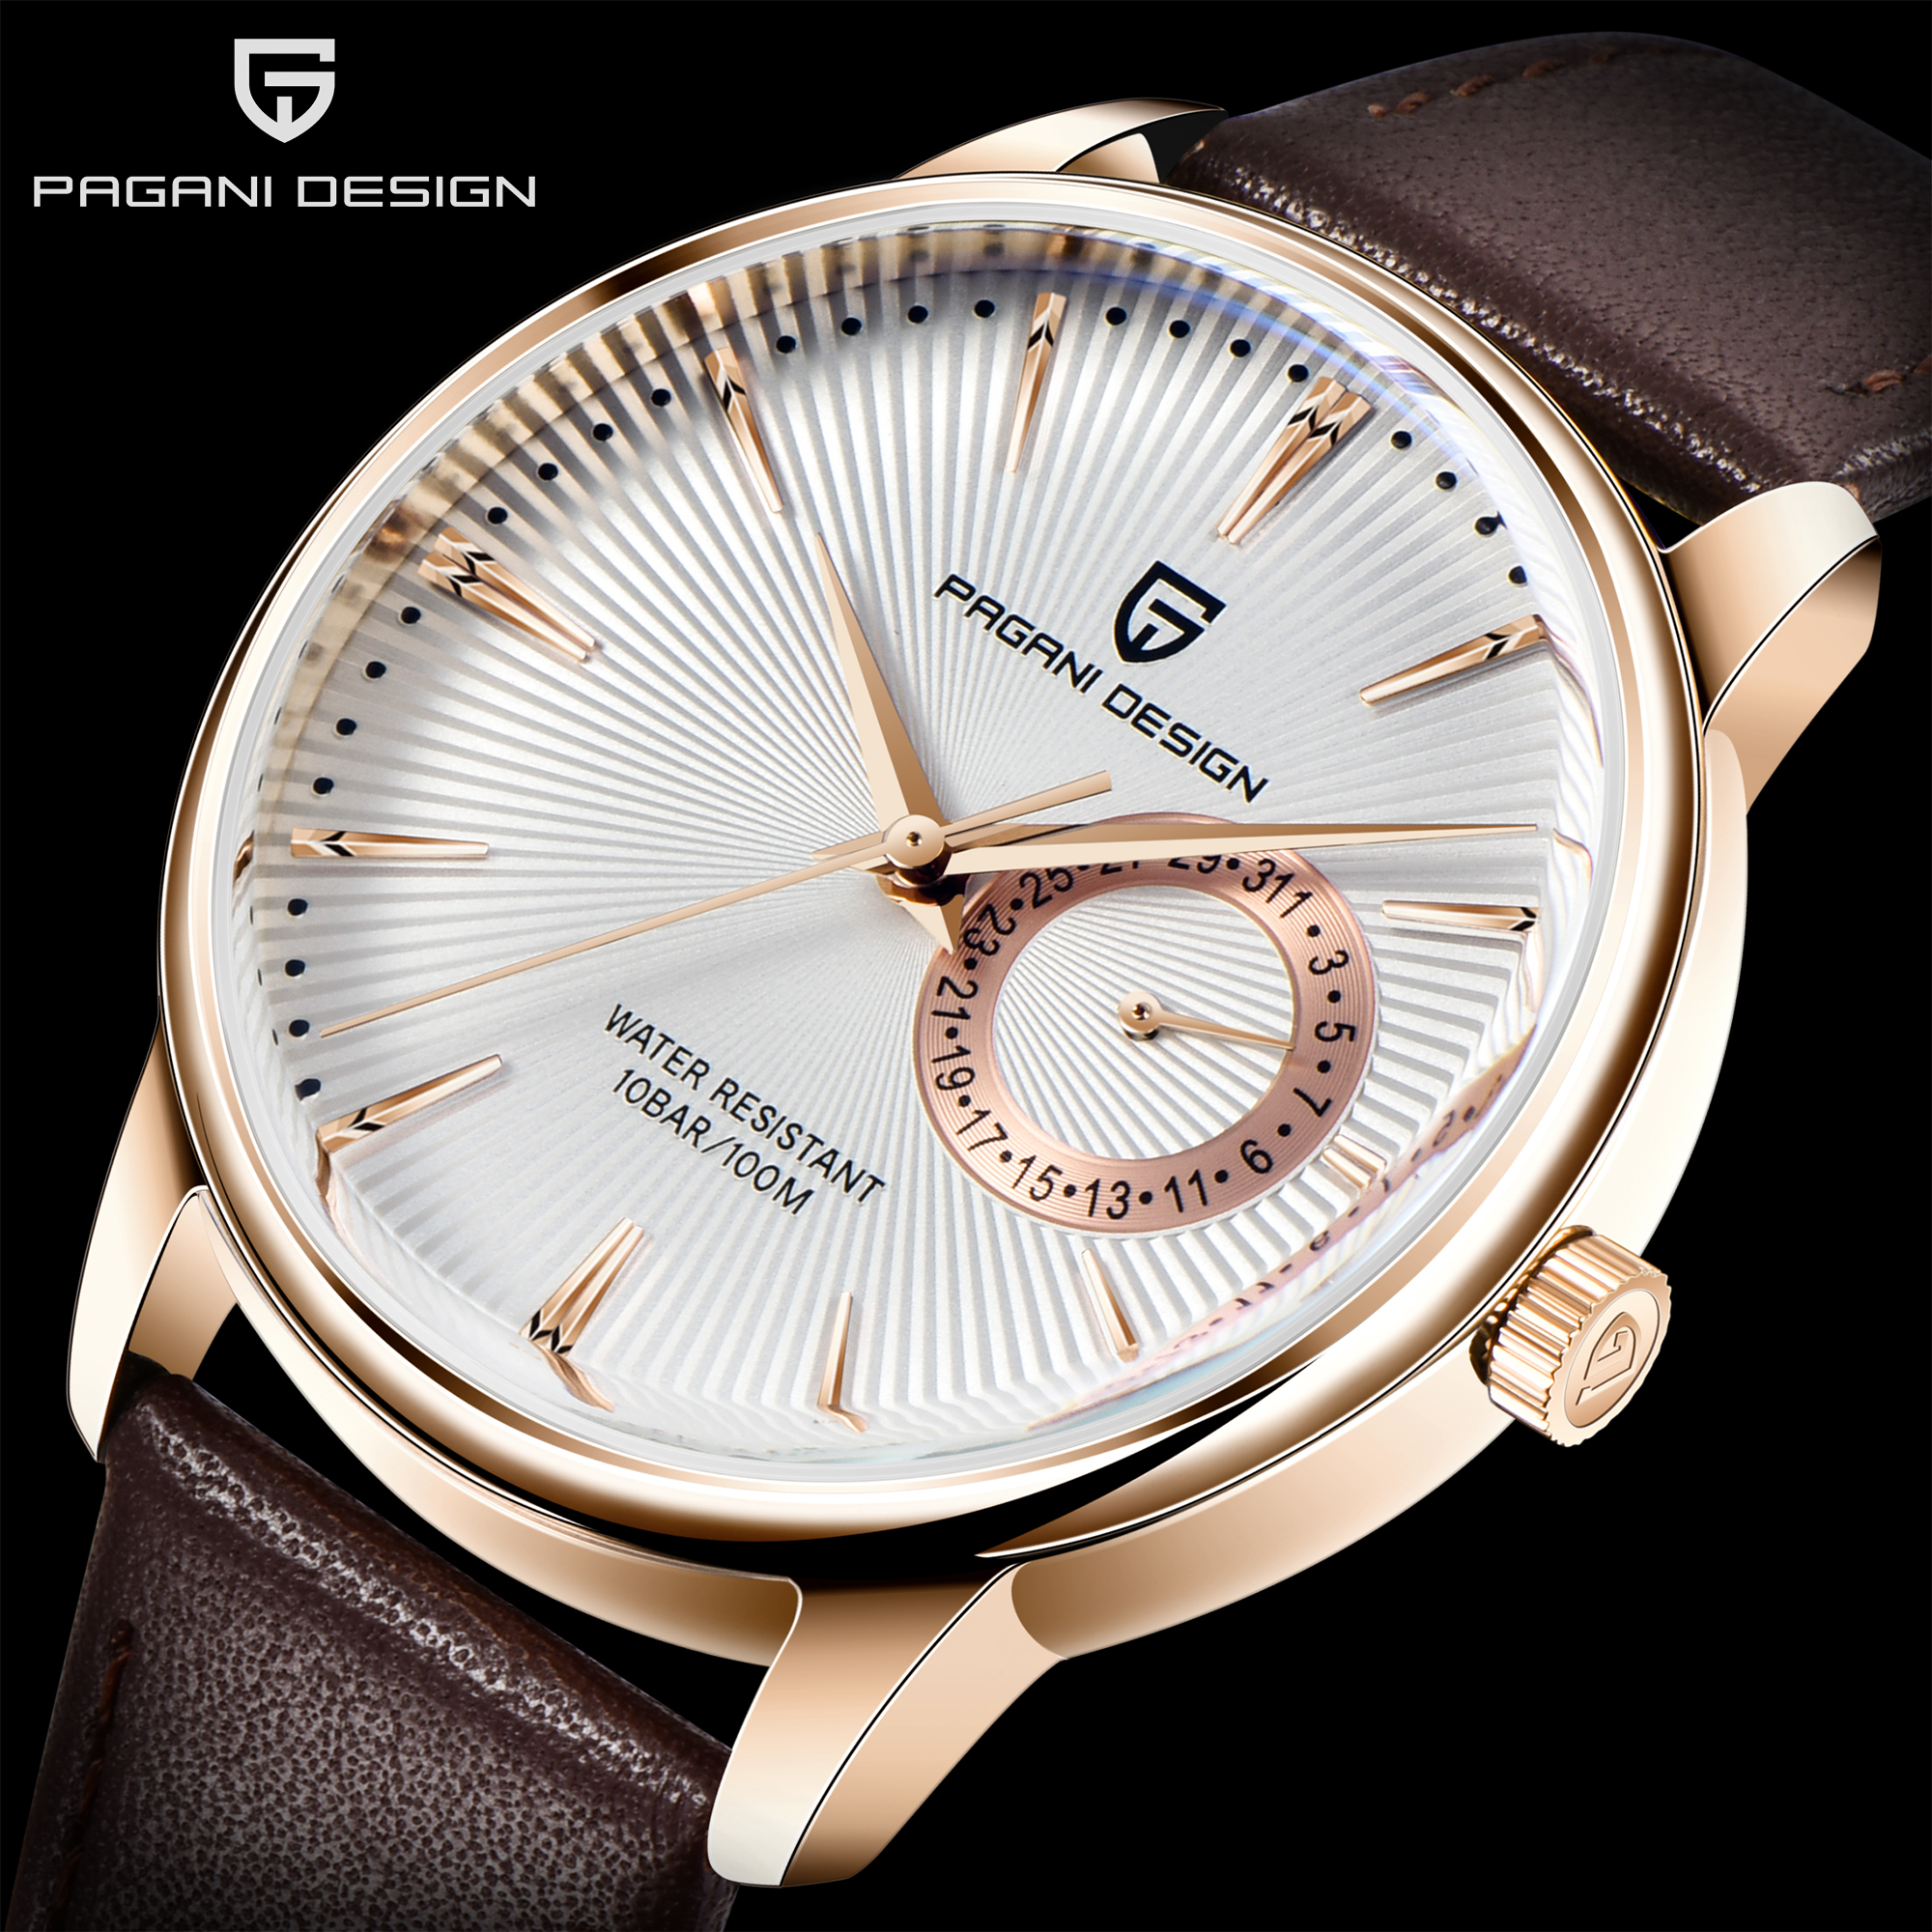 2020 PAGANI DESIGN Top Brand Luxury Waterproof Men Quartz Watch Fashion Casual Sports Watch Men Military Watch Relogio Masculino